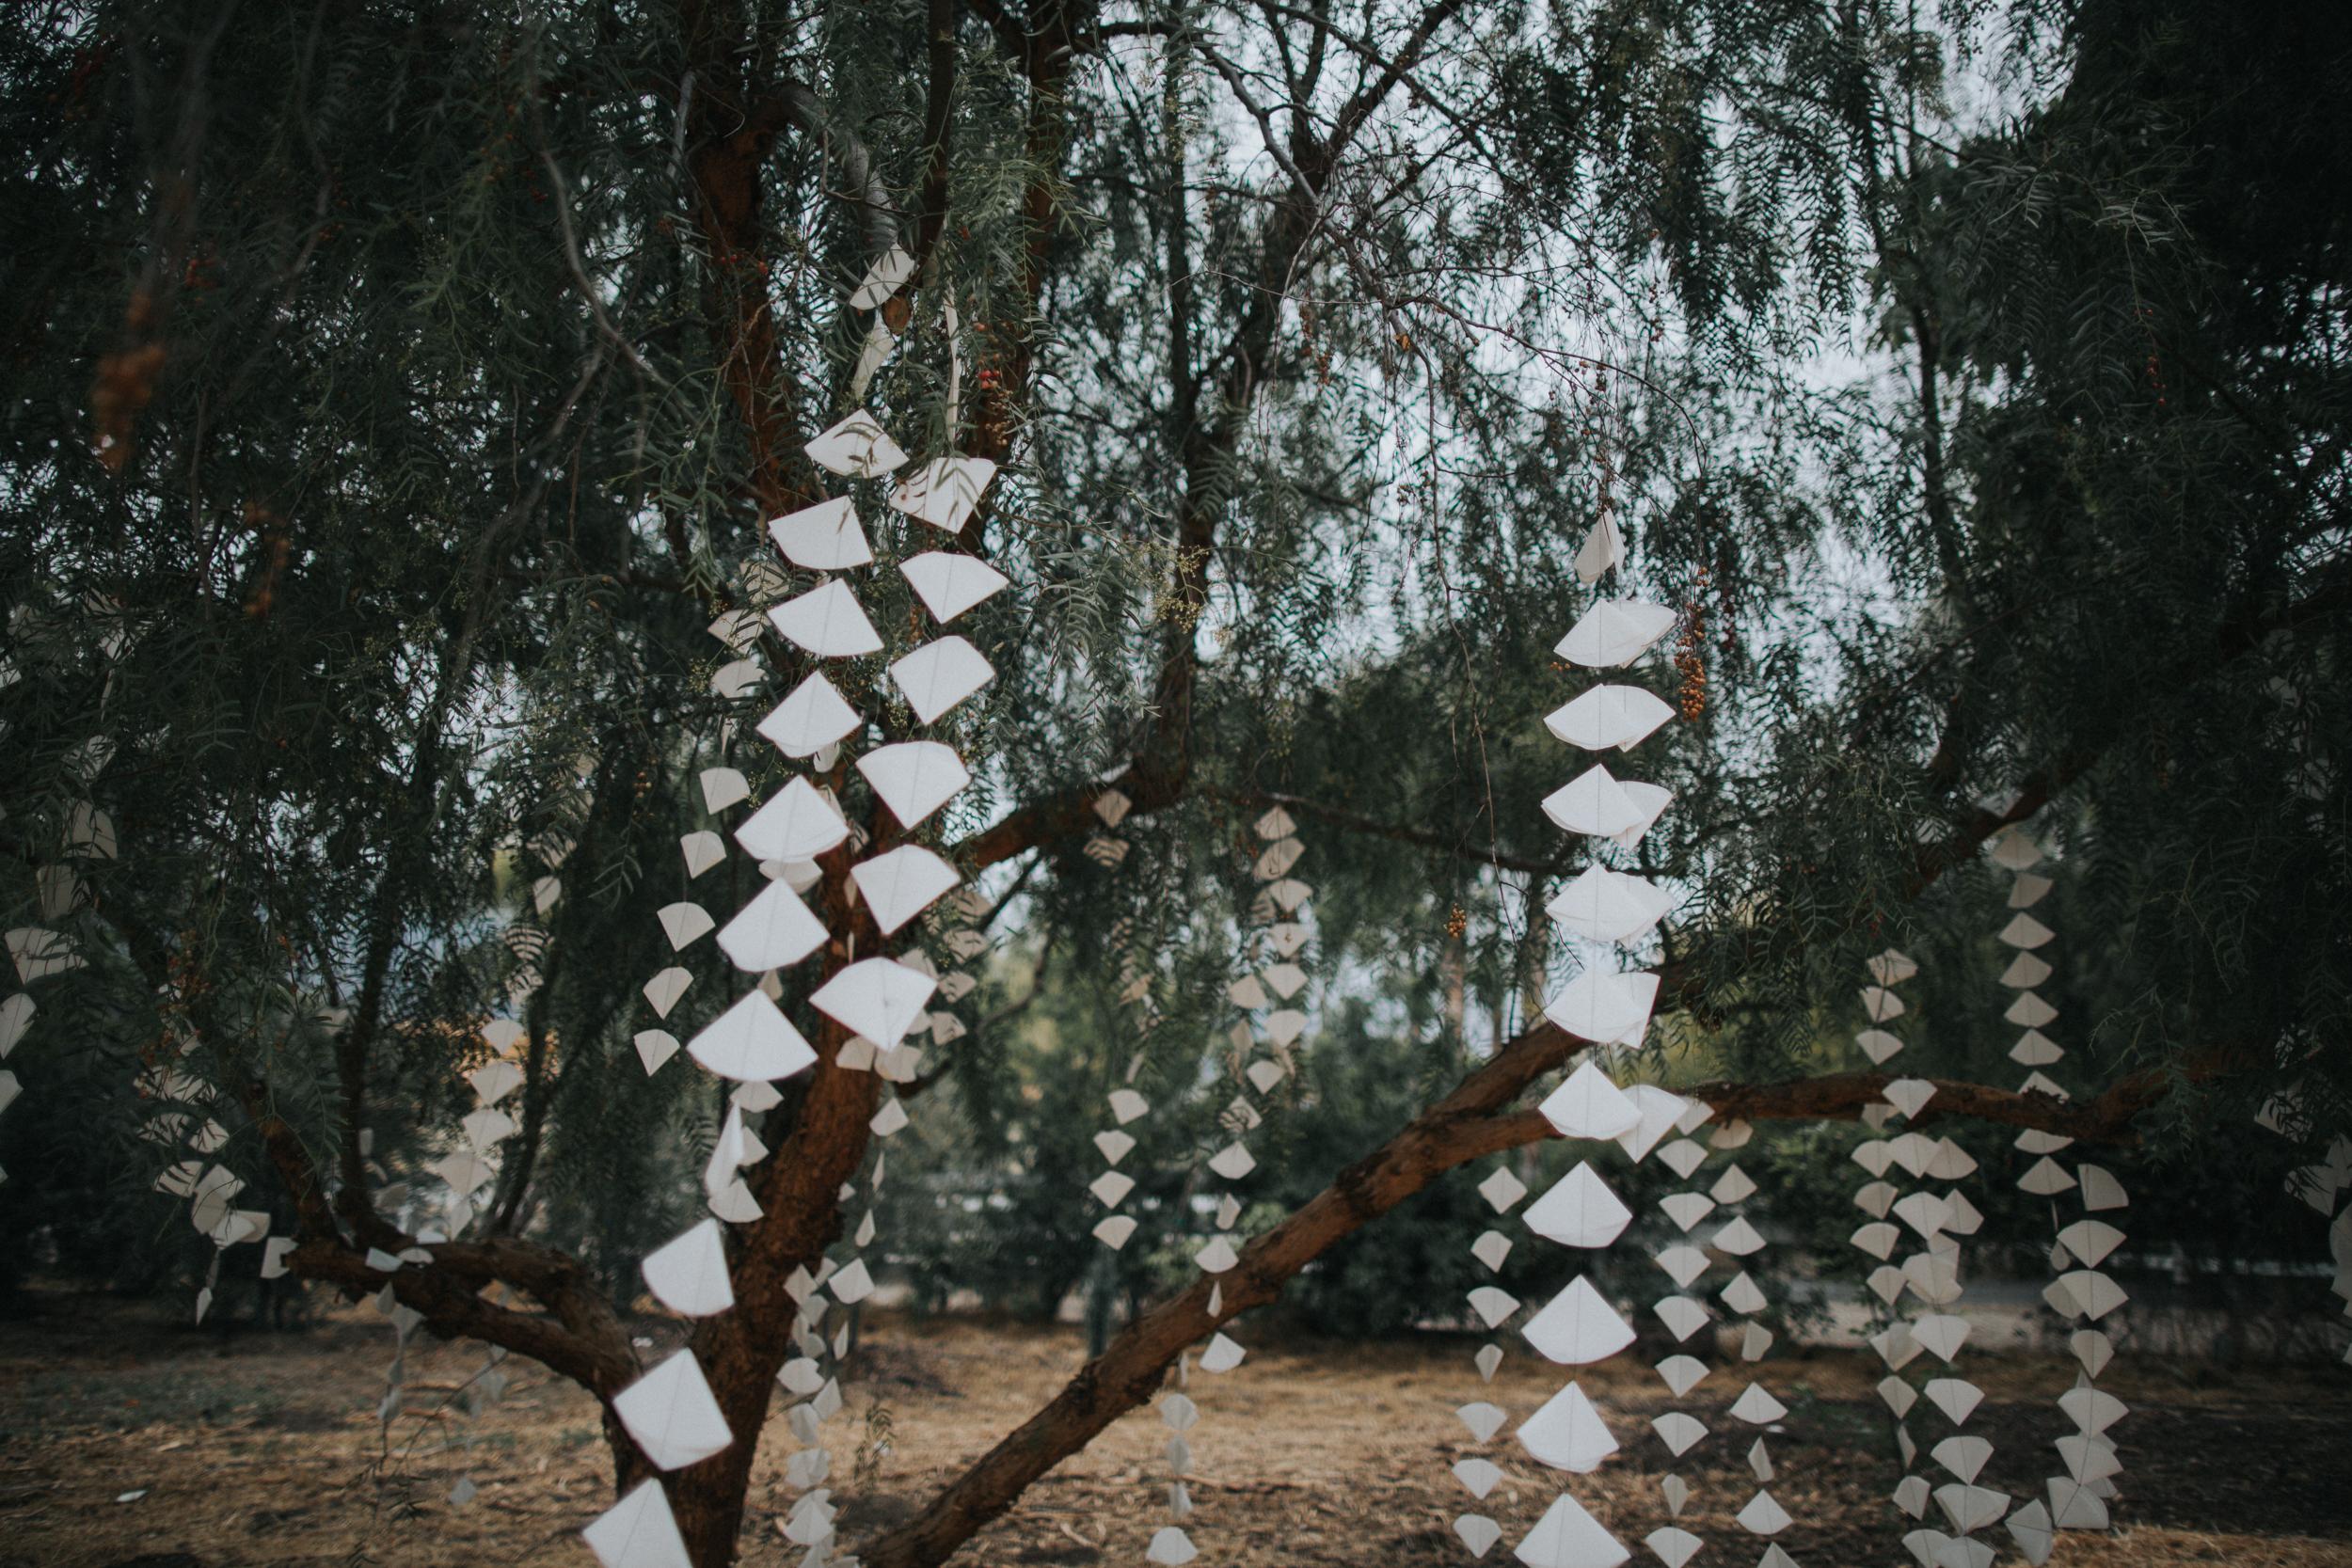 walnut-creek-ranch-ojai-kindred-wedding-photography-9-1.jpg